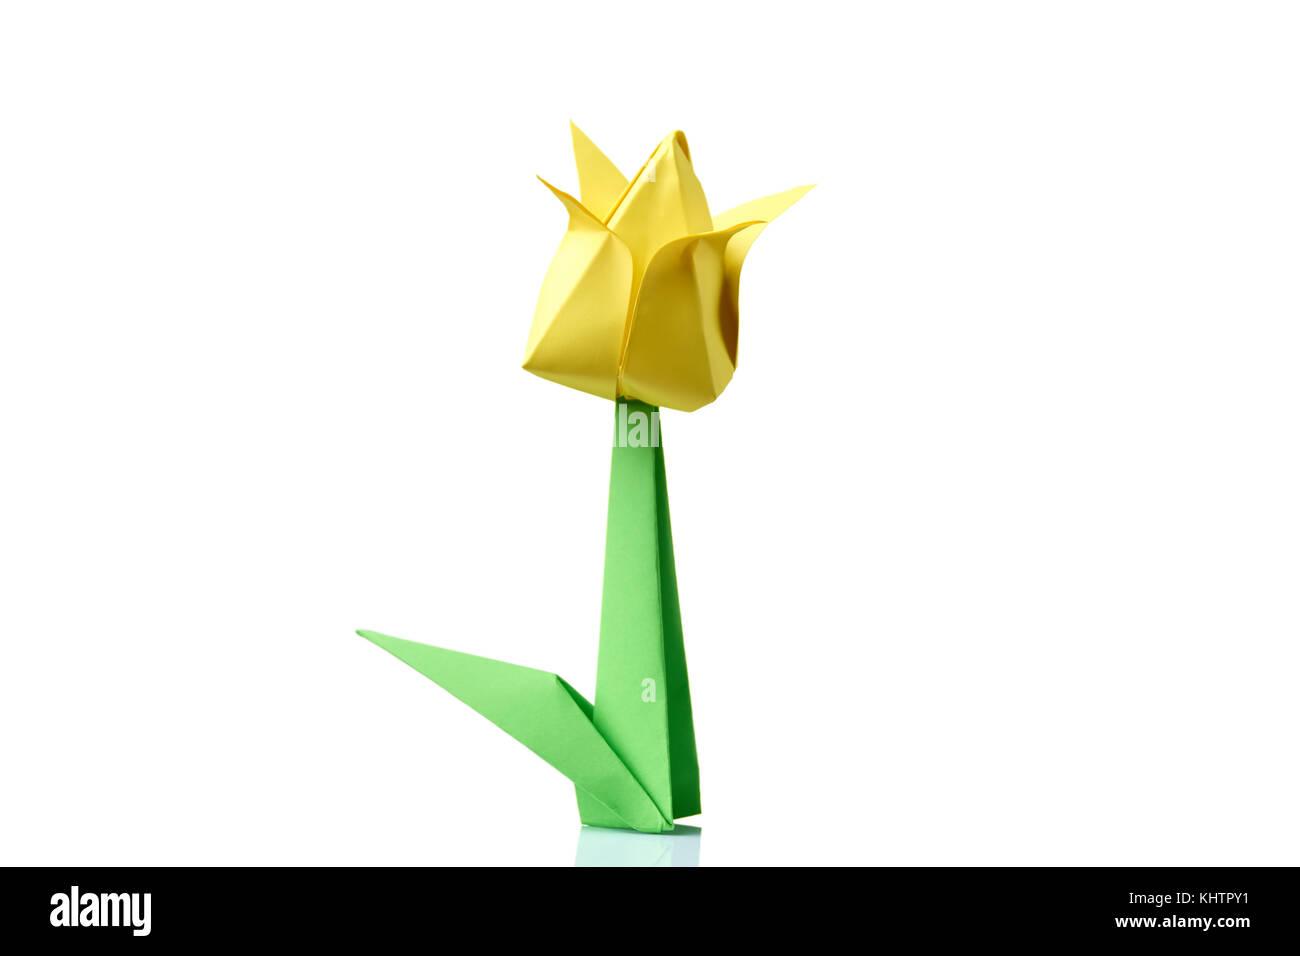 Origami flower tulip stock photos origami flower tulip stock yellow tulip origami flower stock image mightylinksfo